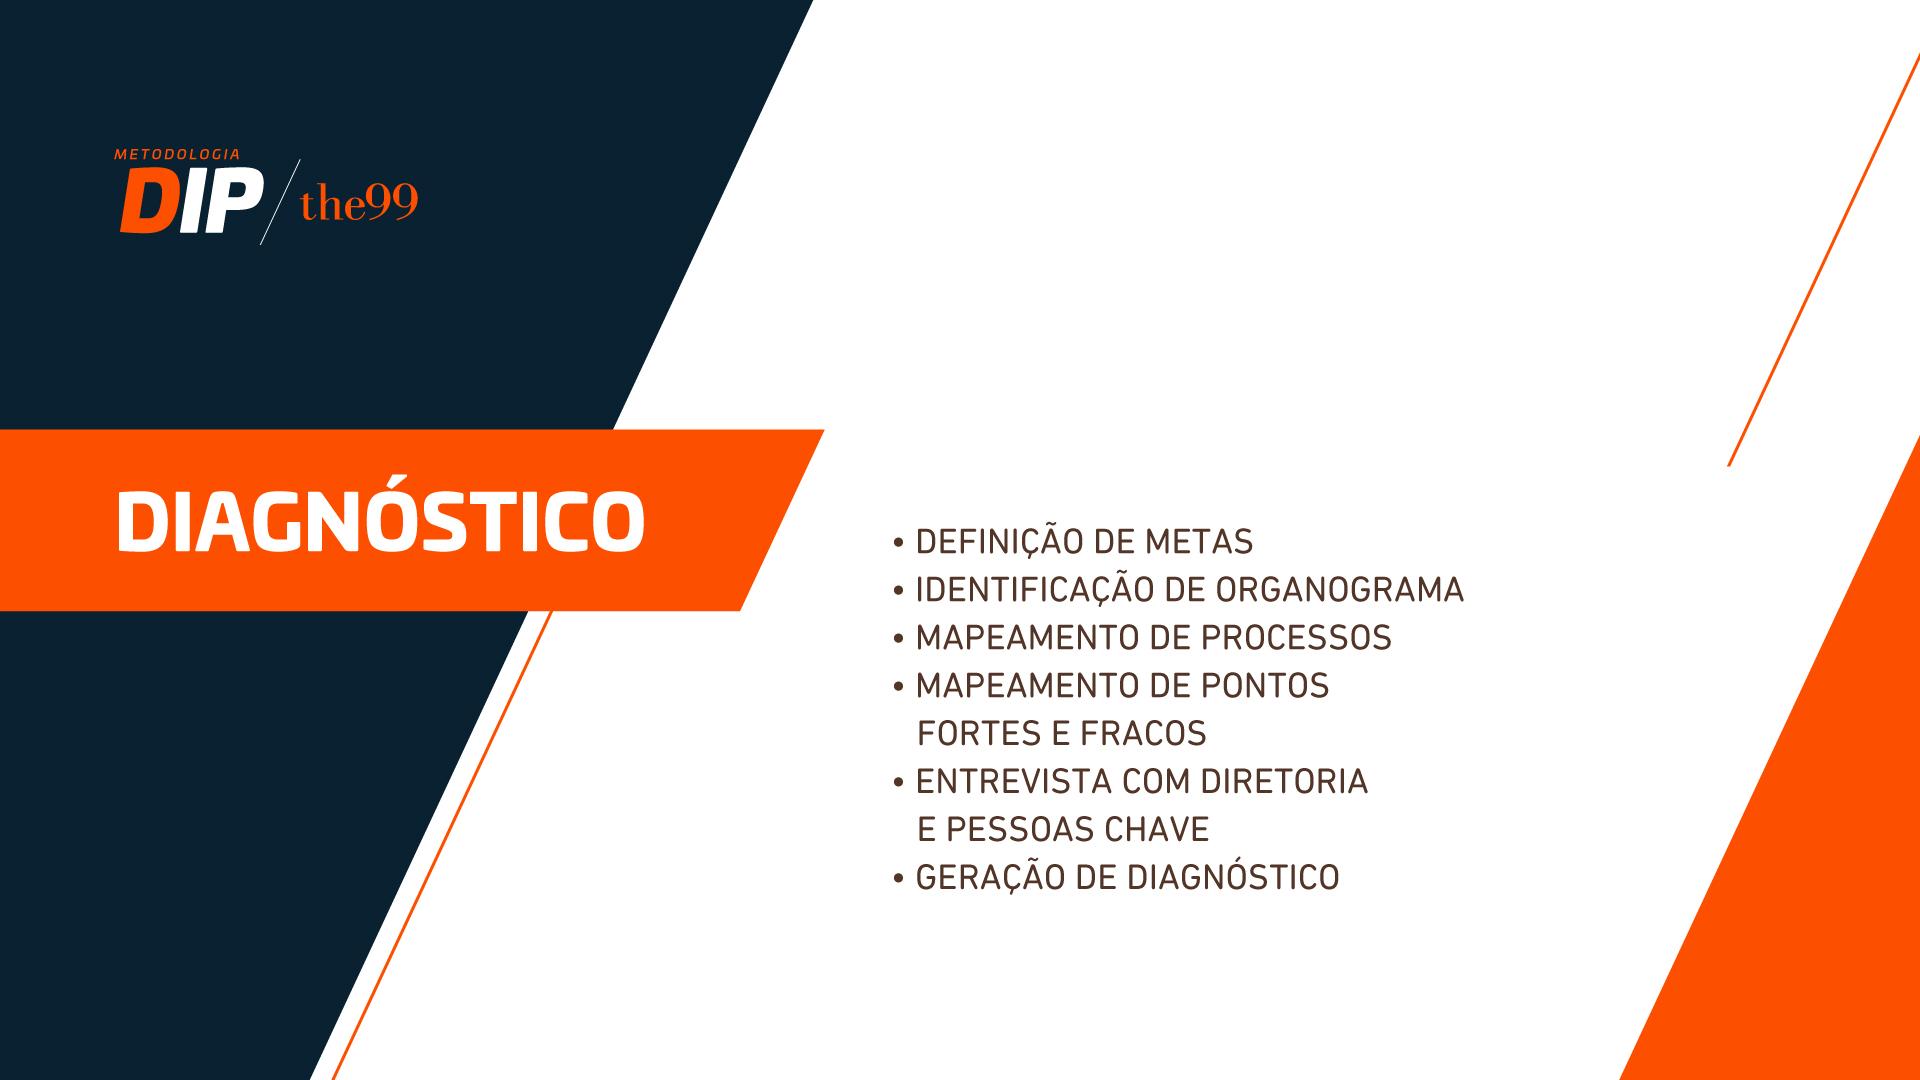 the99-metodologia-dip-diagnostico